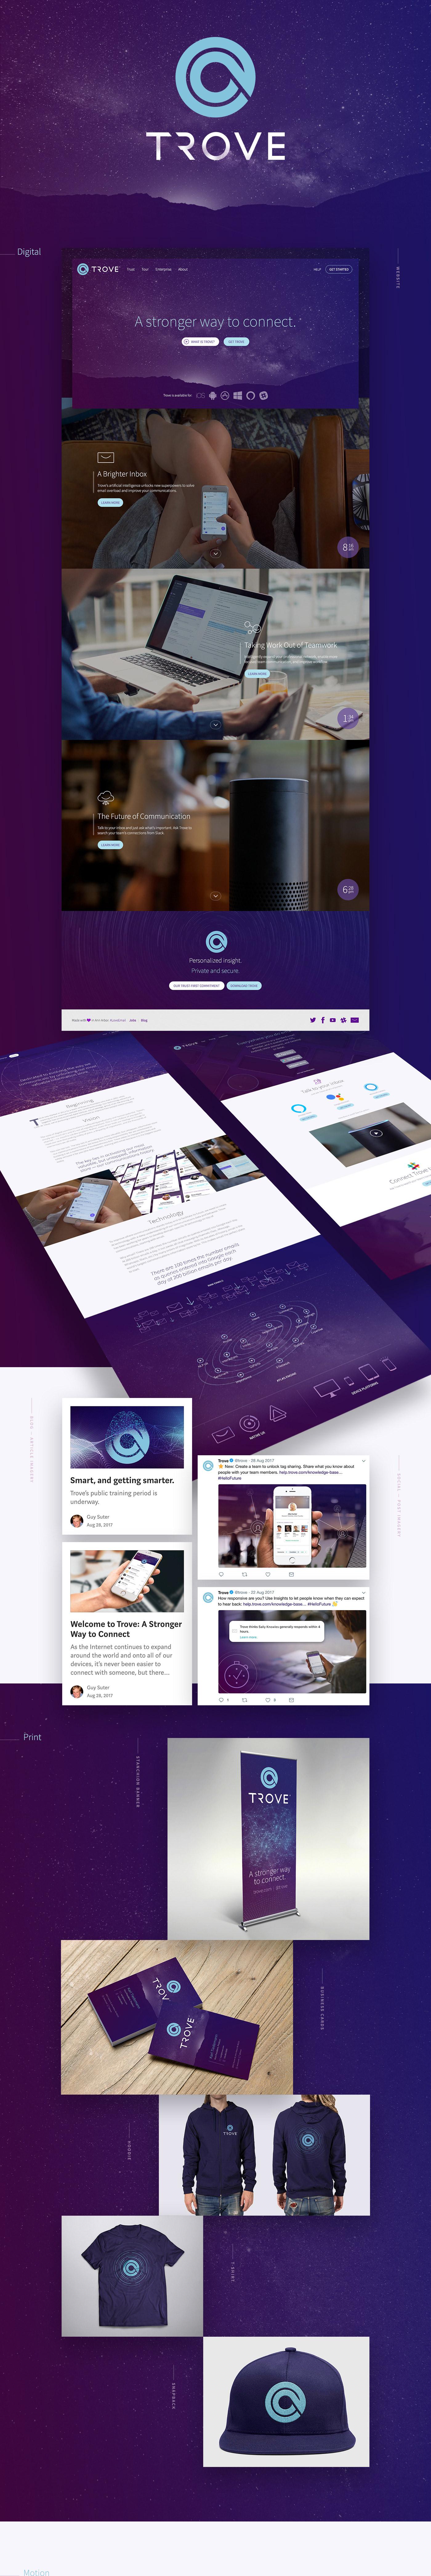 trove marketing   Email networking app purple stars